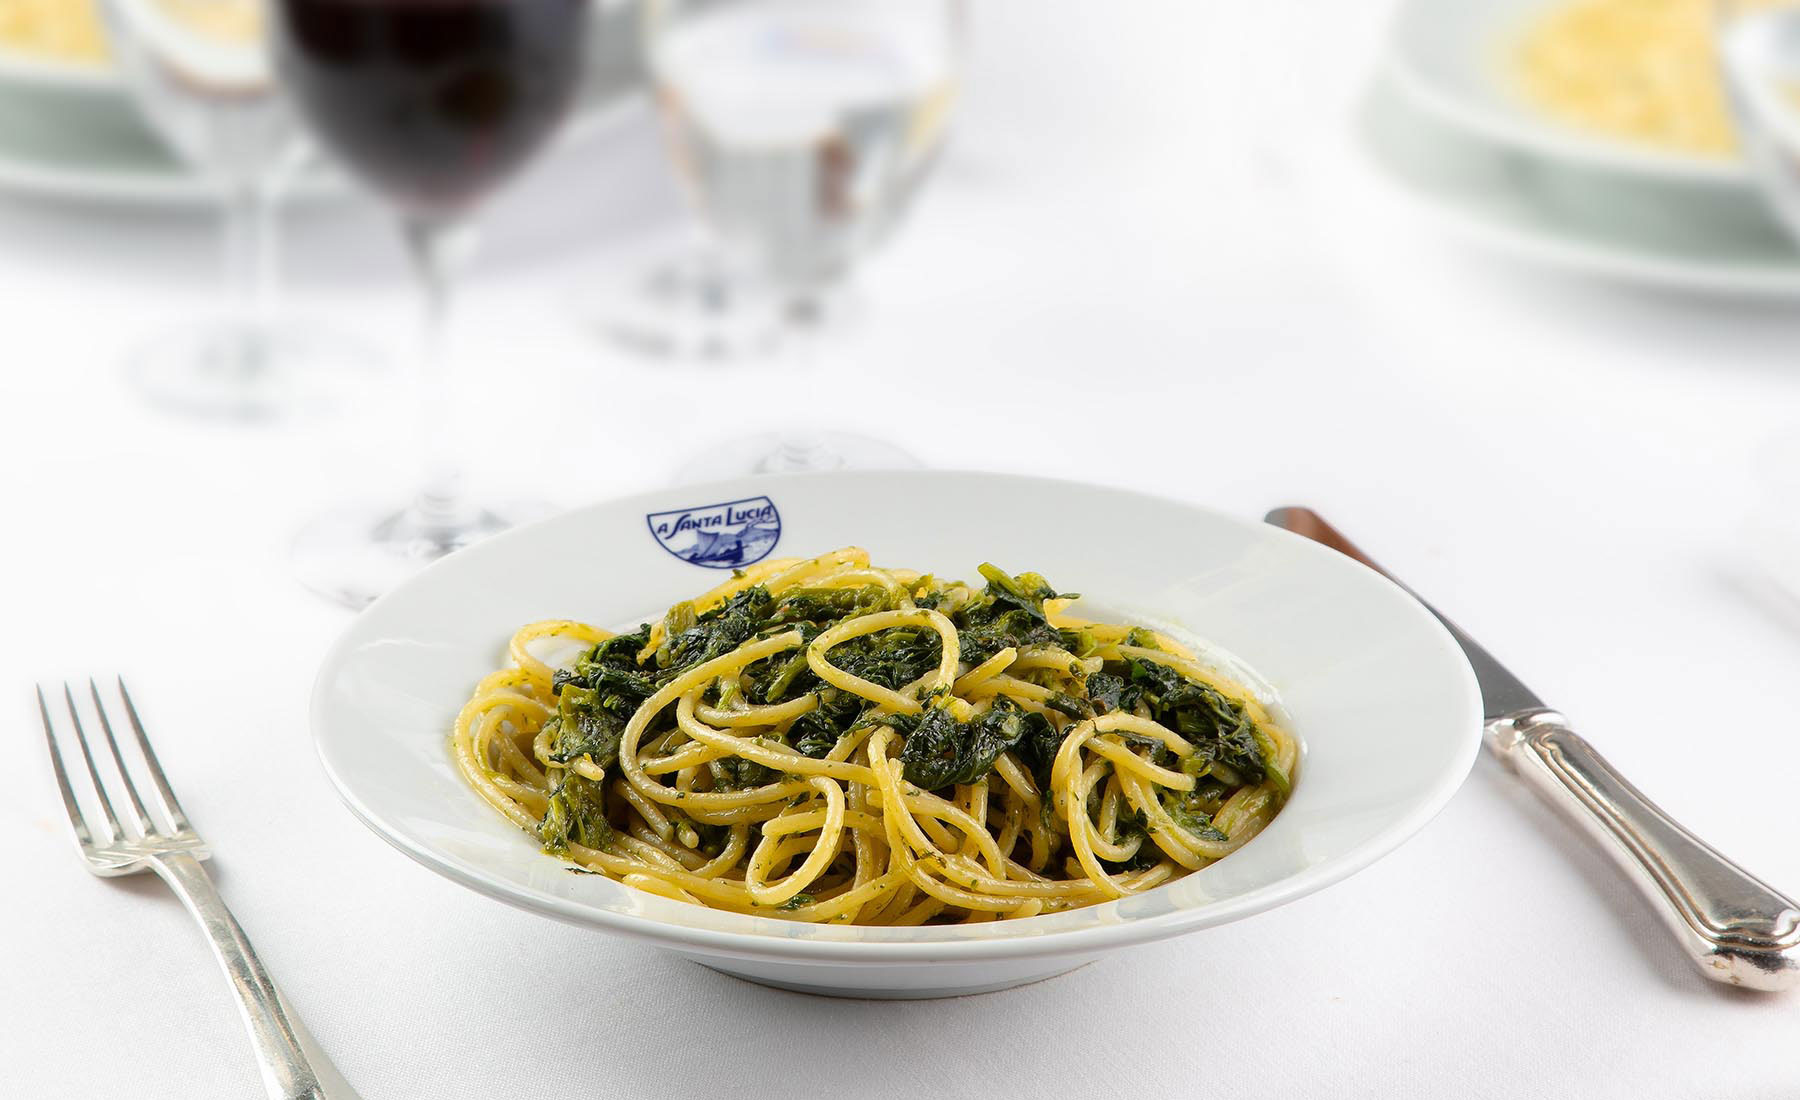 Spaghetti with cime di rape (turnip greens ) and anchovy